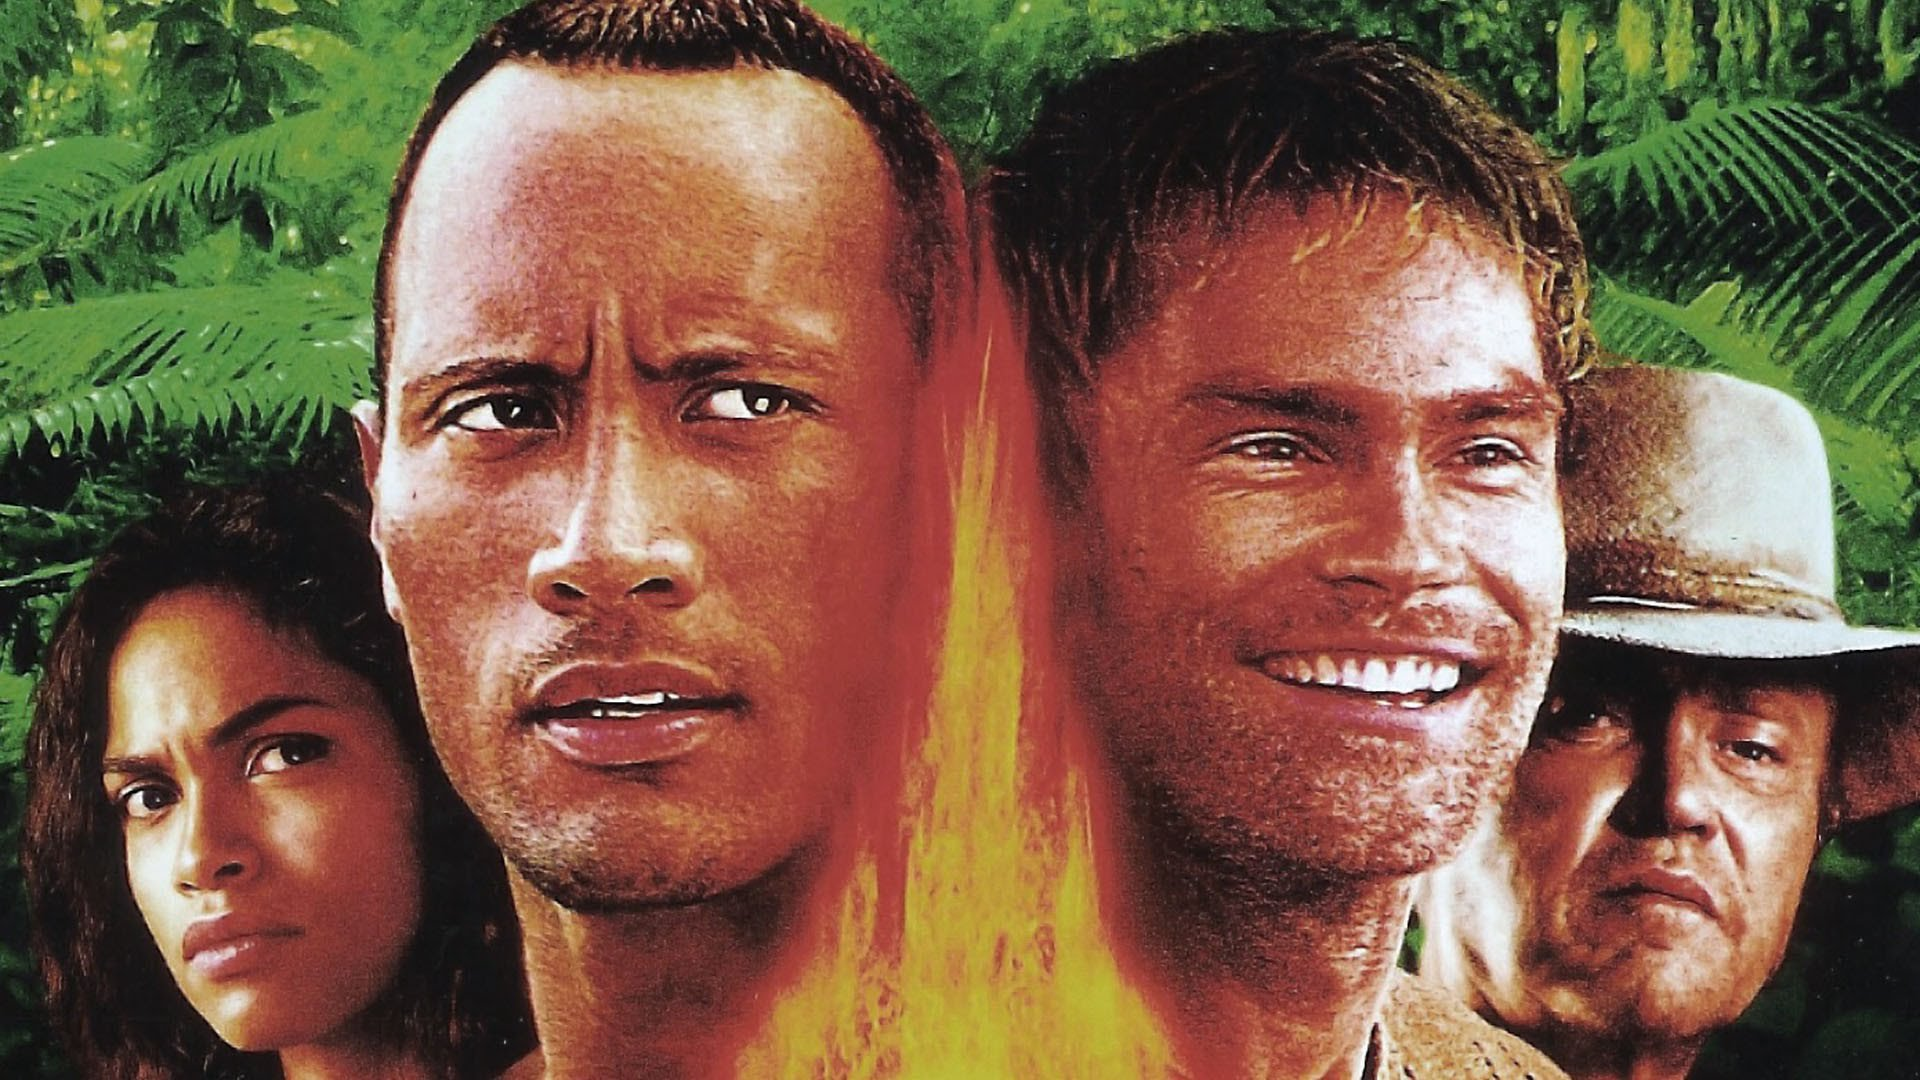 Il tesoro dell'Amazzonia - Film 2004 - Everyeye Cinema